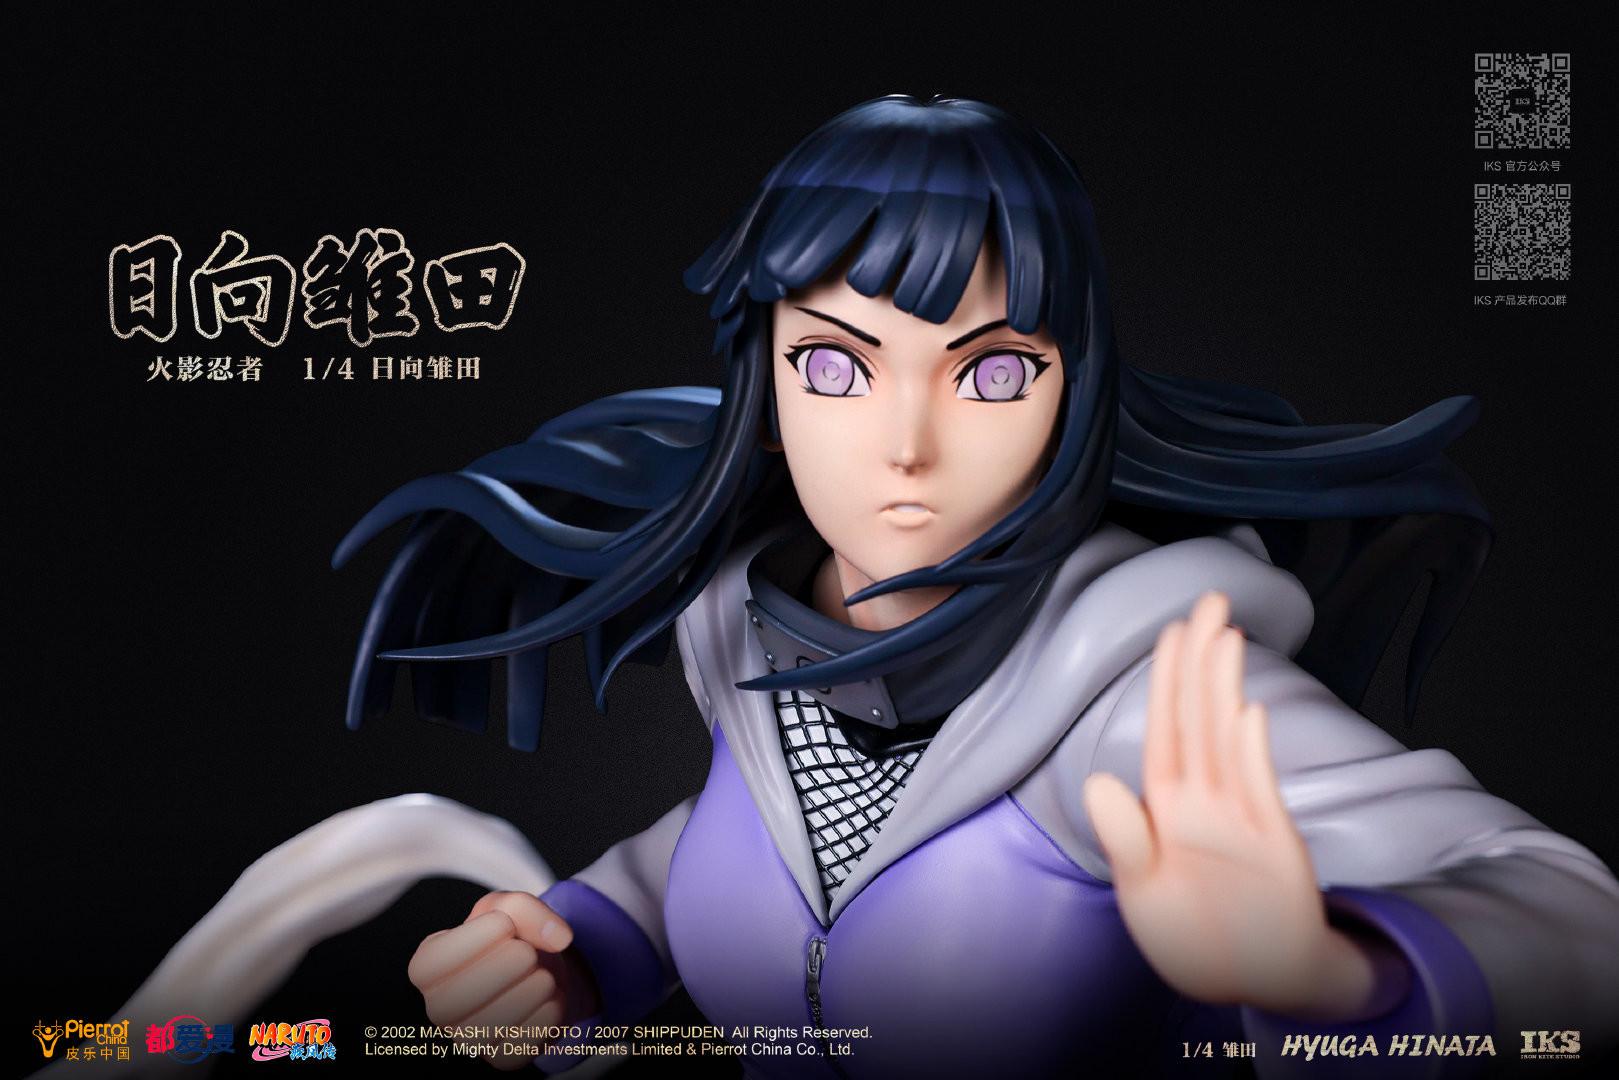 Link a Naruto la statua di Hinata Hyuga da Iron Kite Studio – (5)